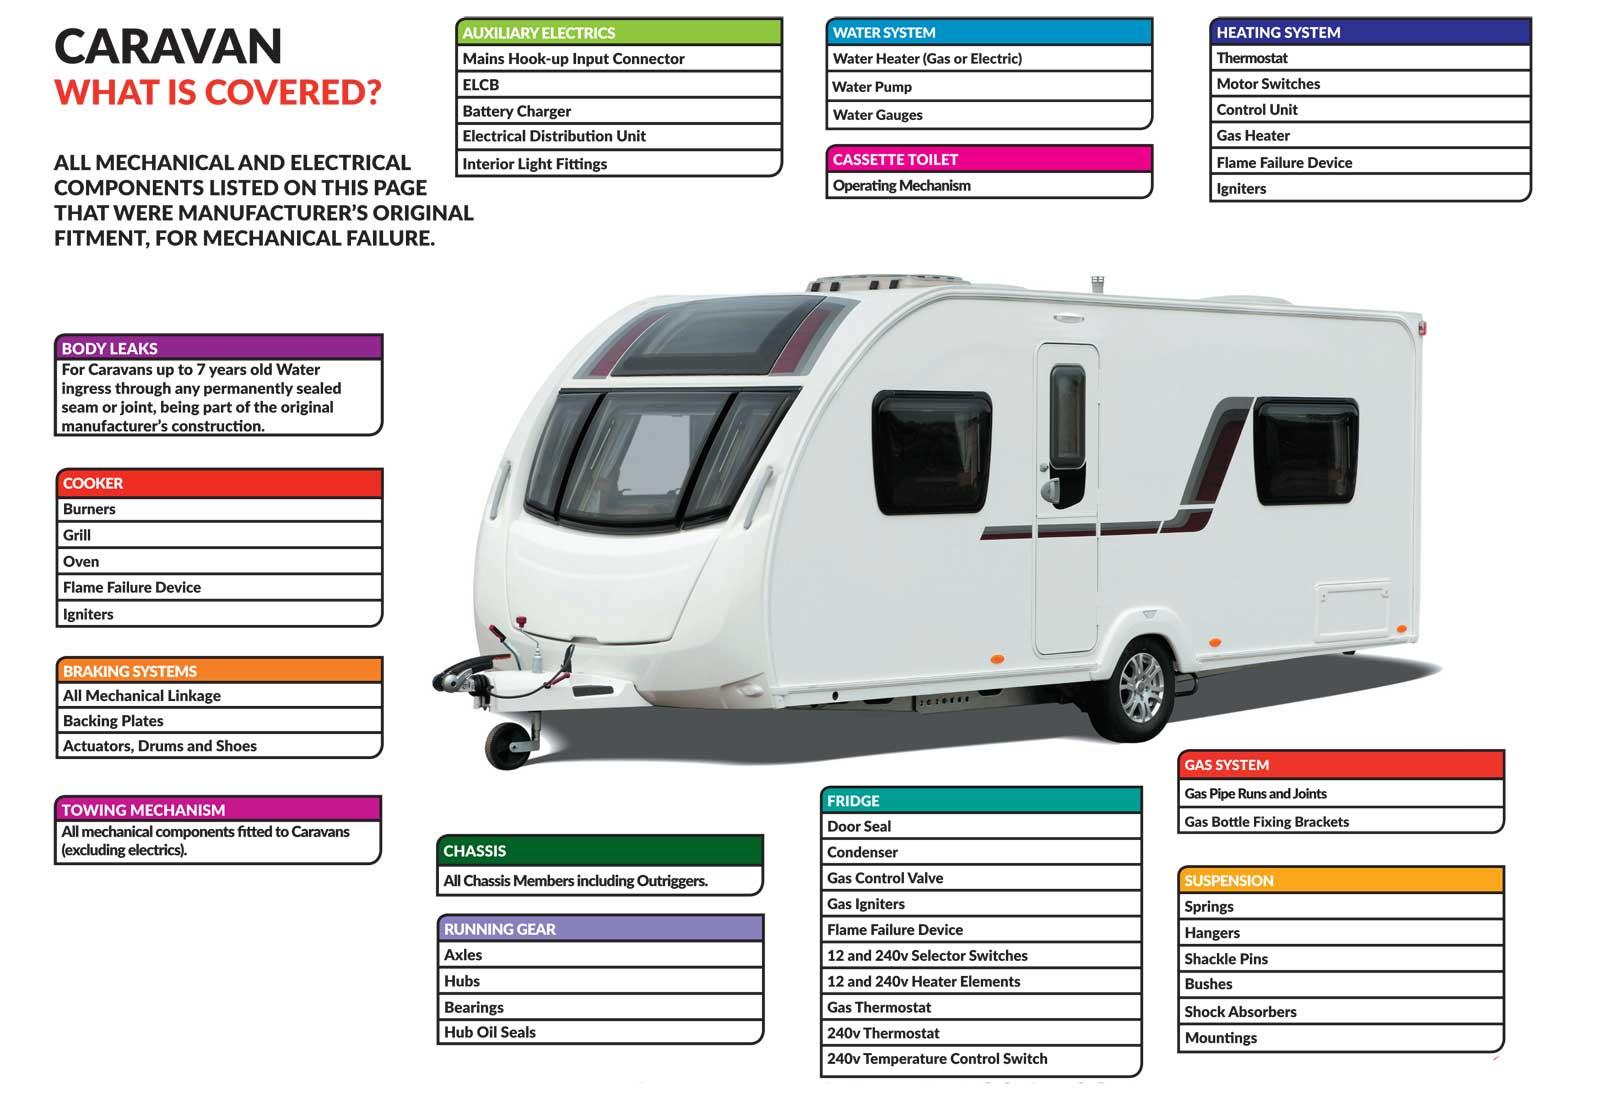 Caravan-Covered